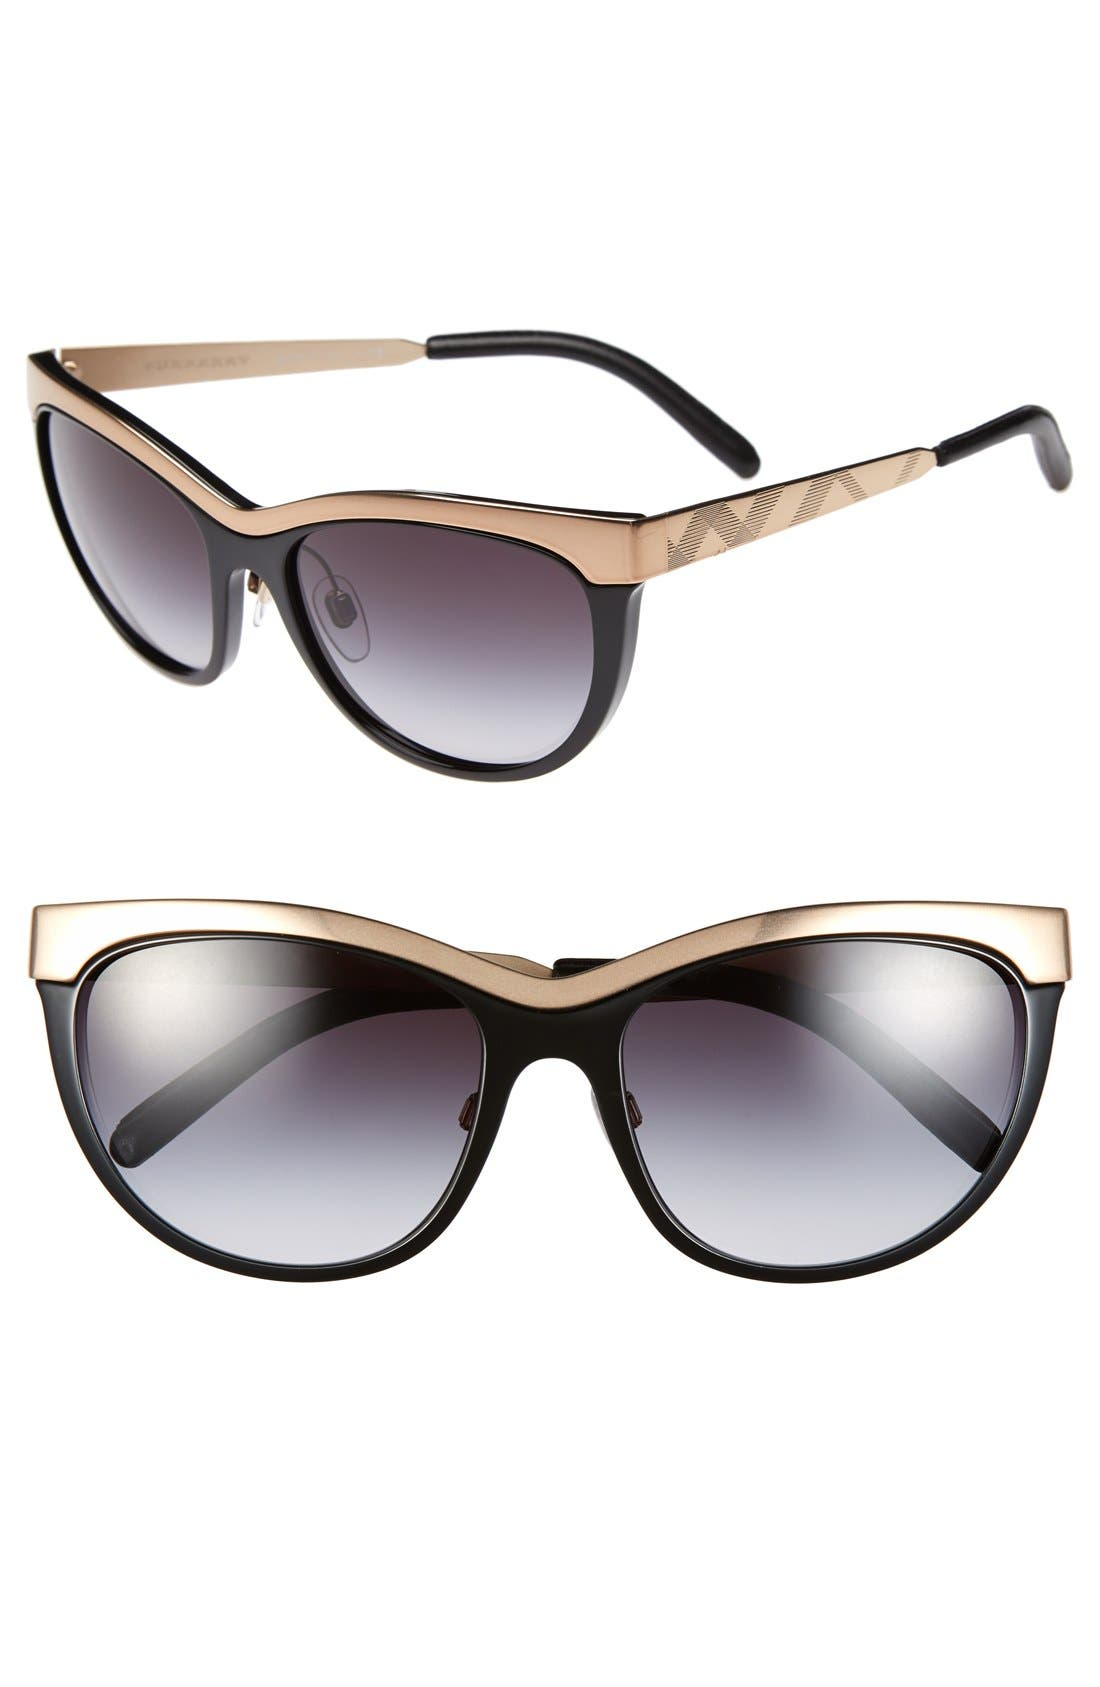 Alternate Image 1 Selected - Burberry 57mm Cat Eye Sunglasses